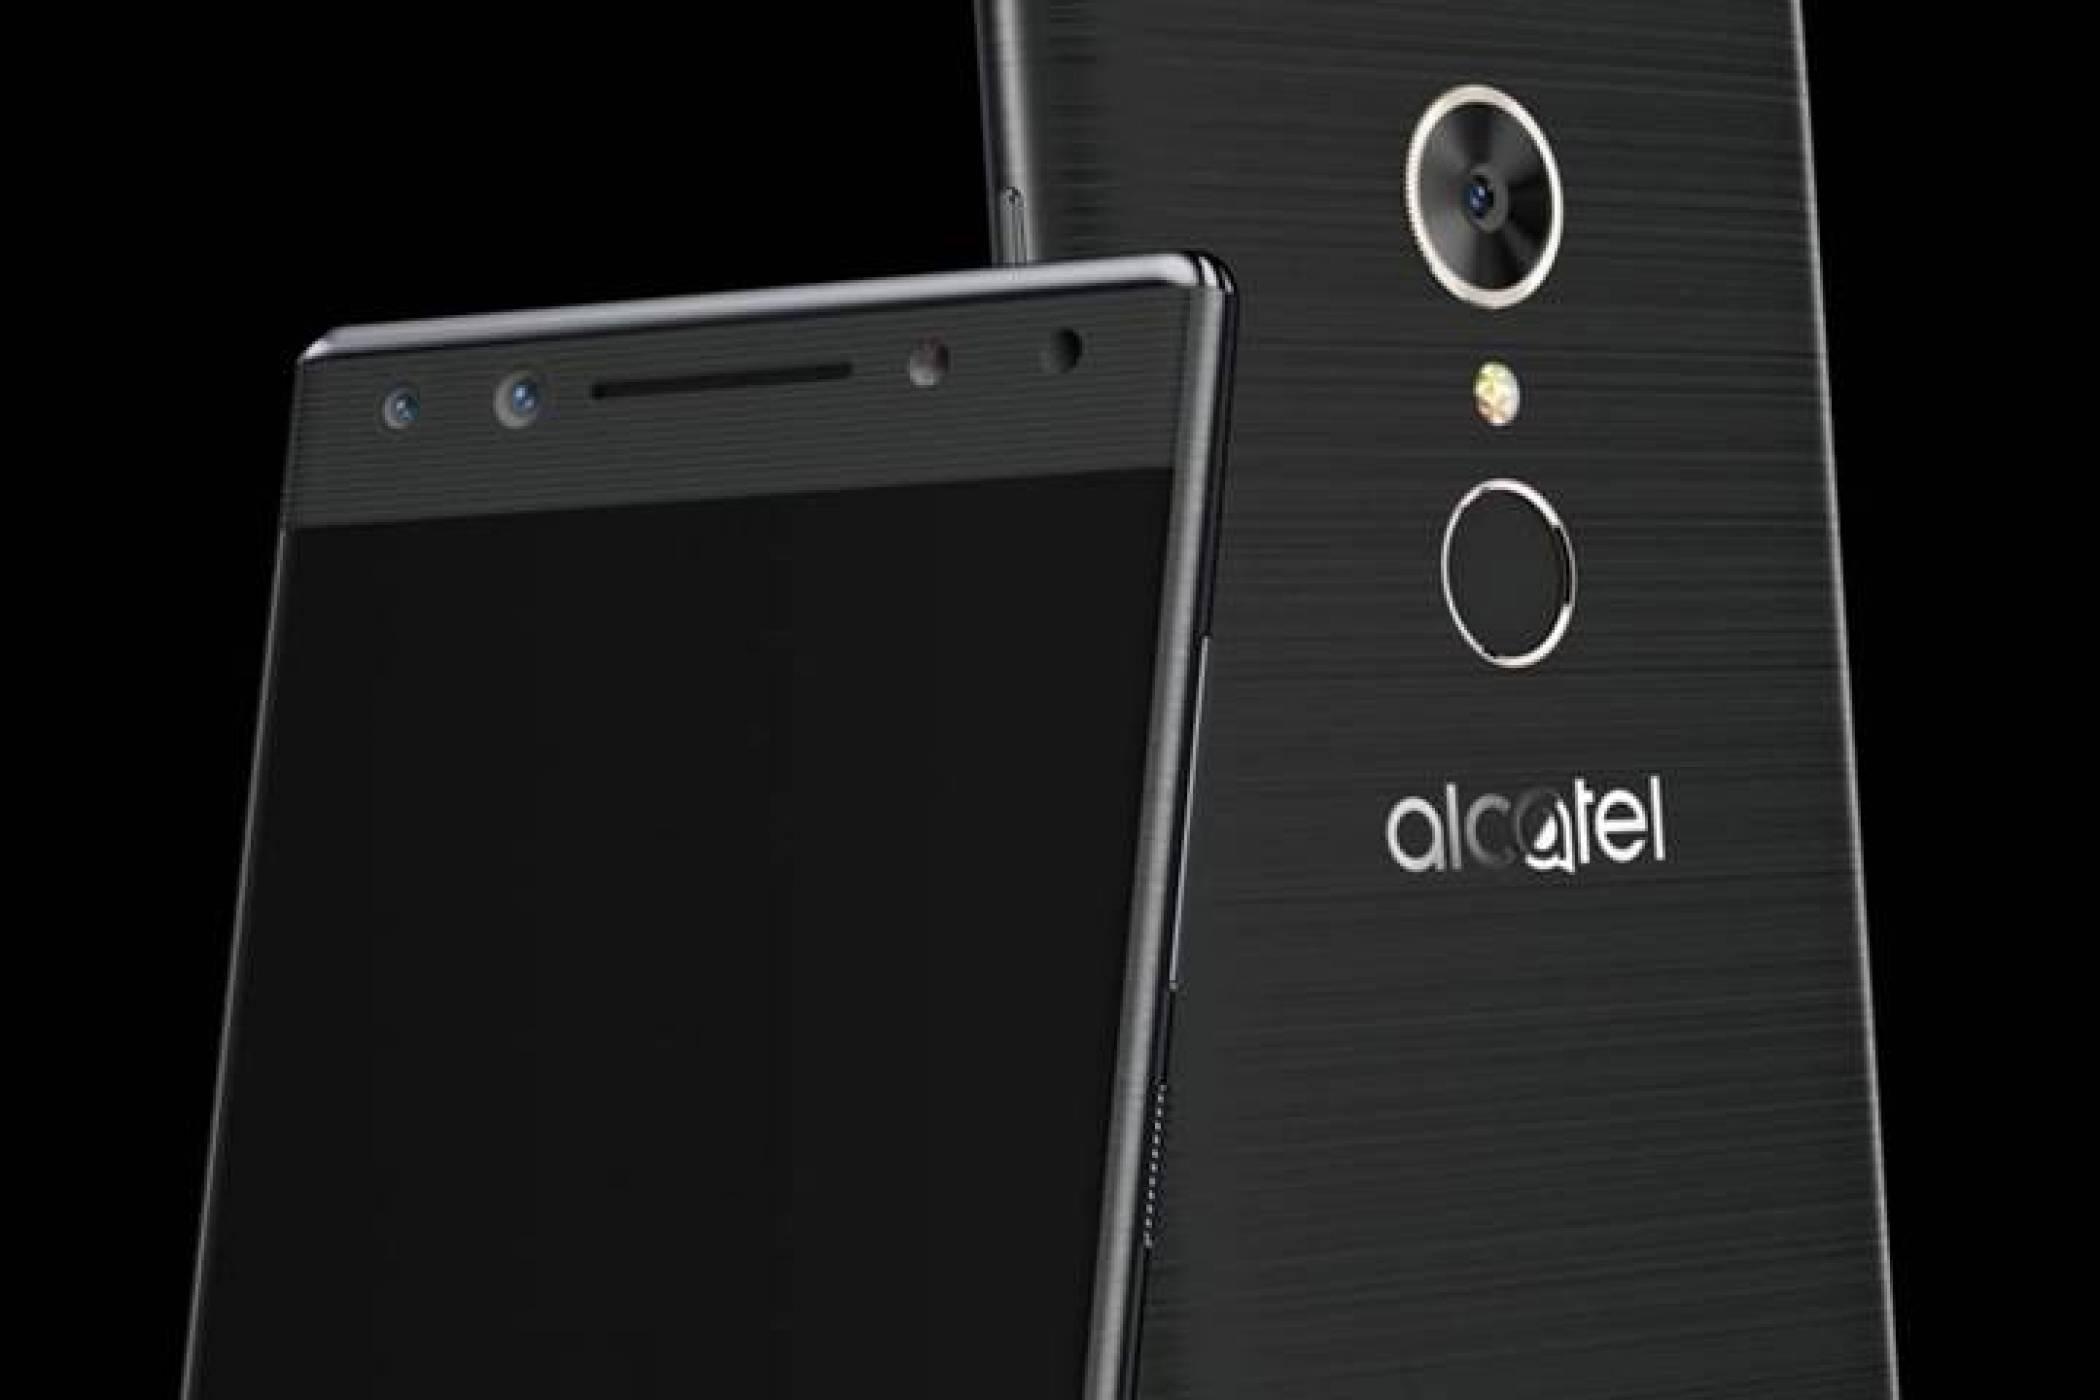 TCL ще атакува CES 2019 с нови модели на Alcatel и BlackBerry